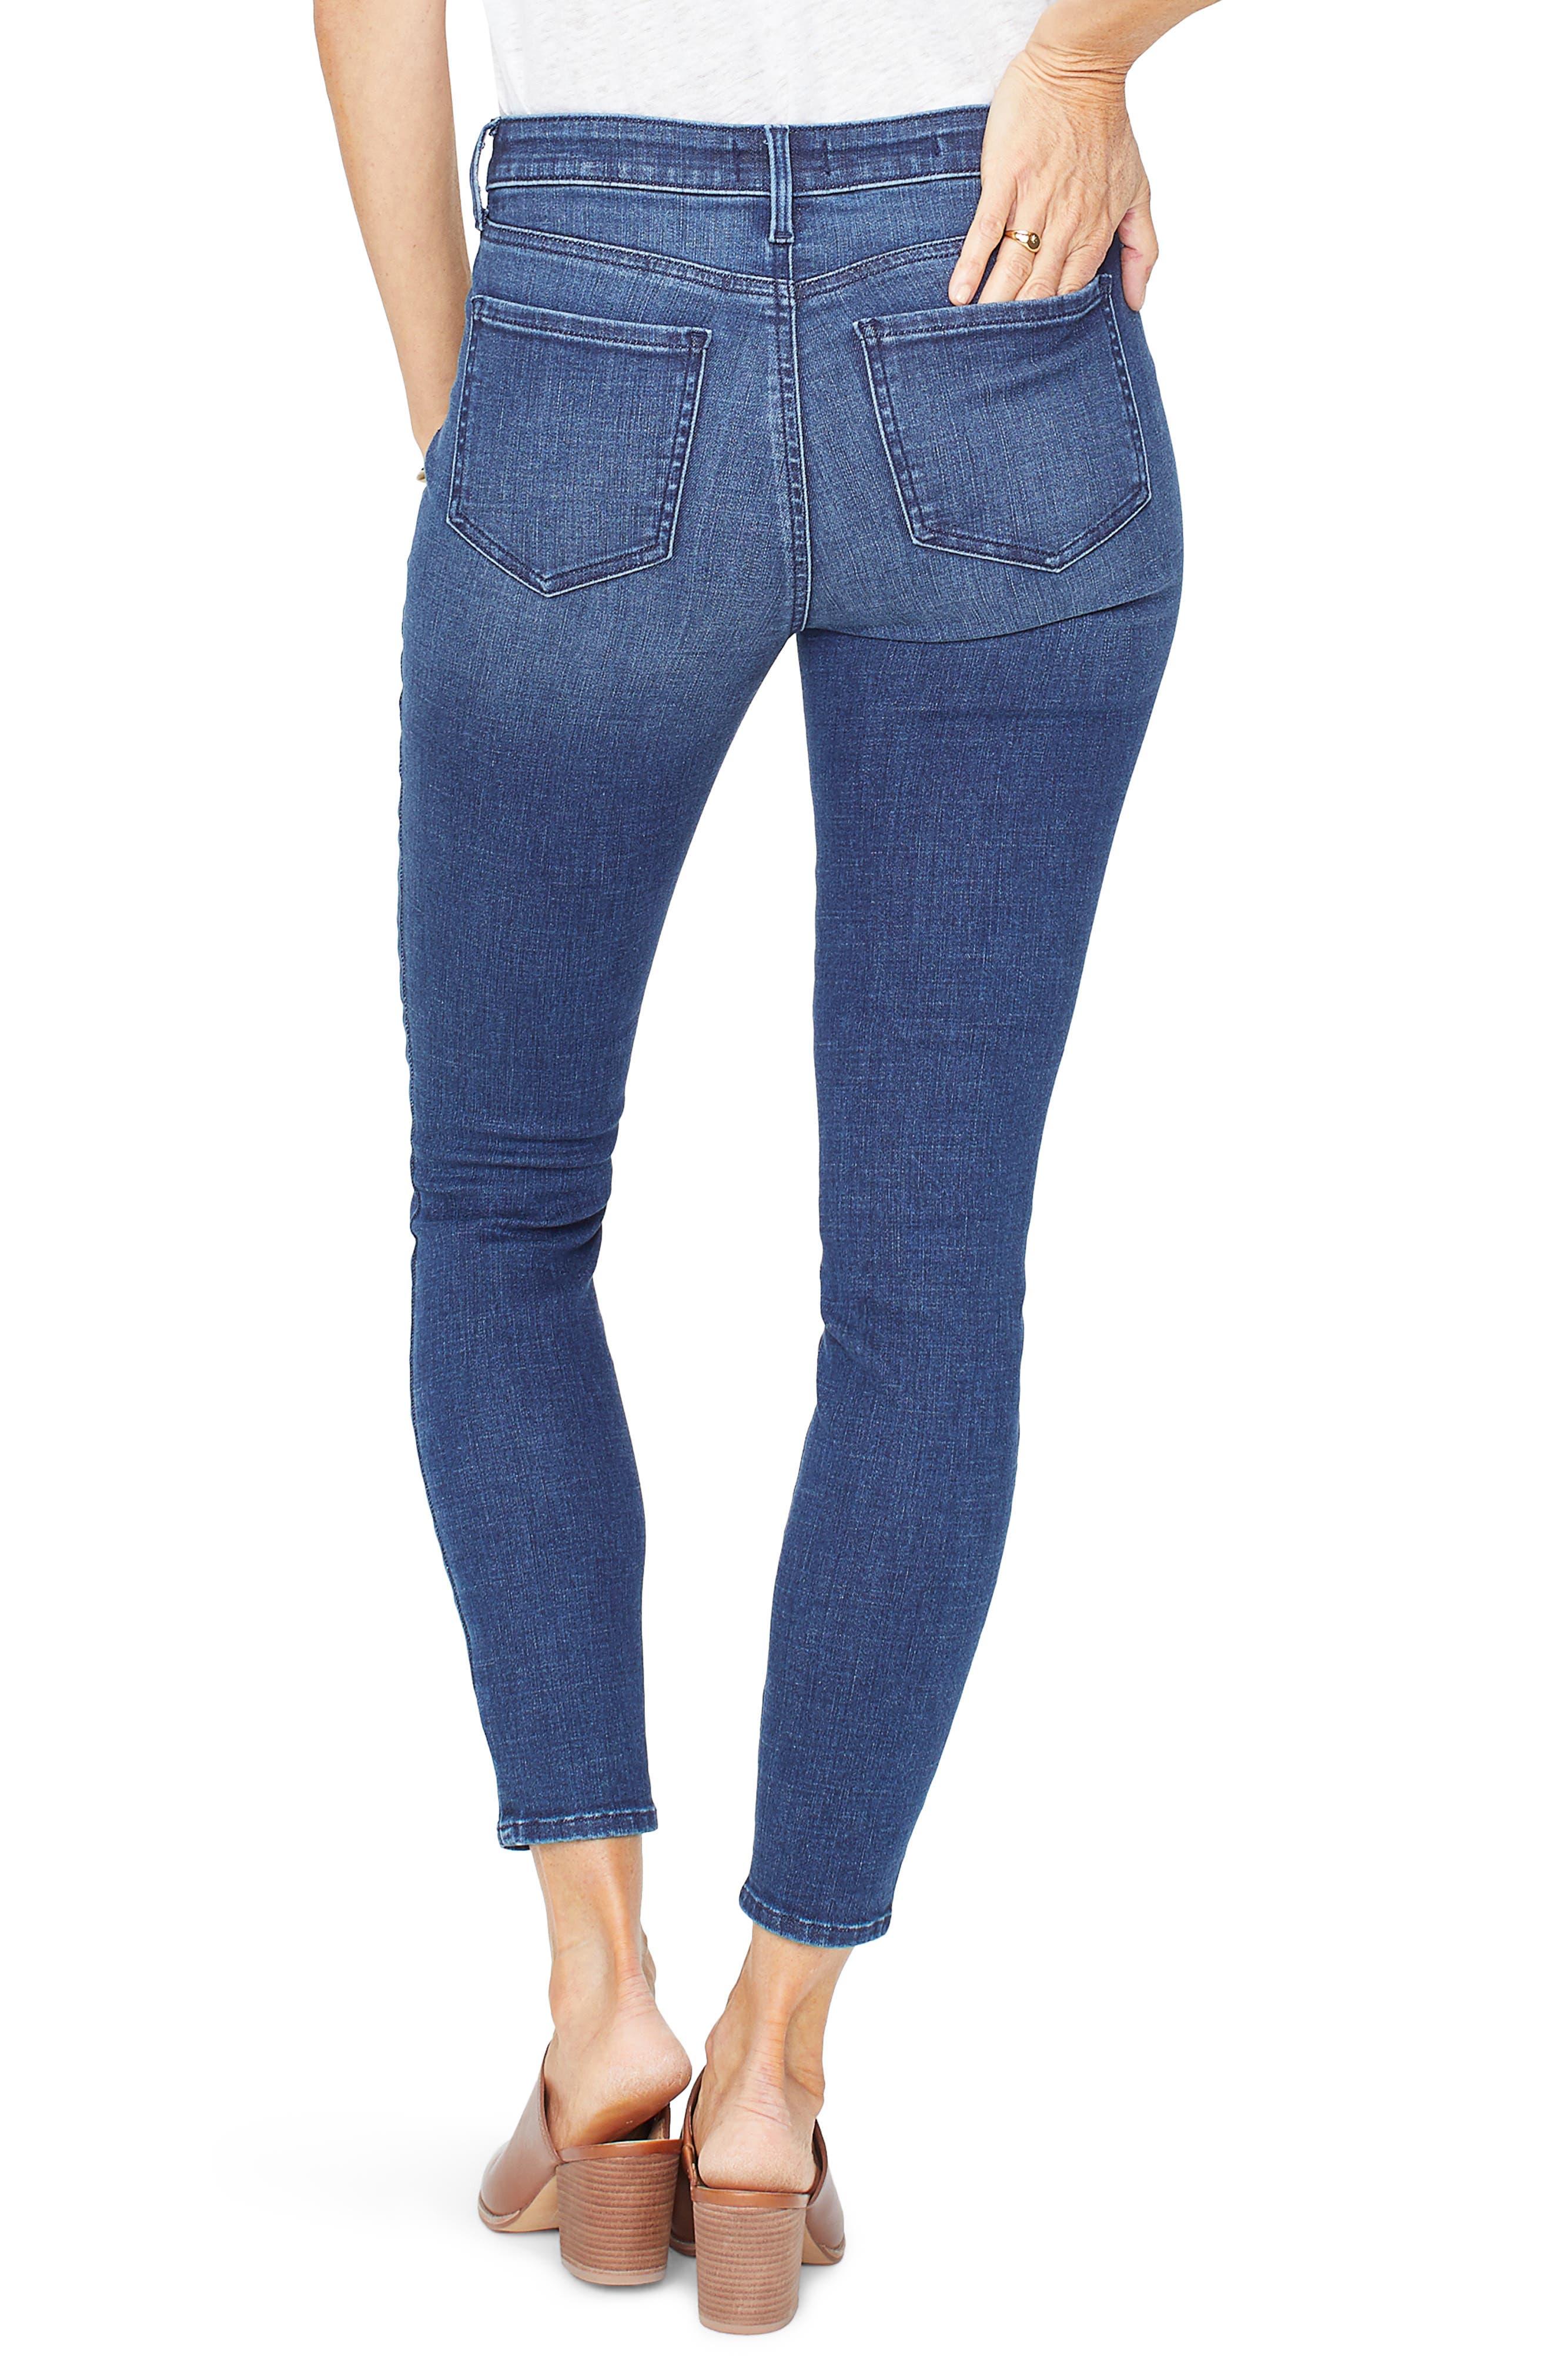 NYDJ, Ami Ankle Skinny Jeans, Alternate thumbnail 2, color, REGO